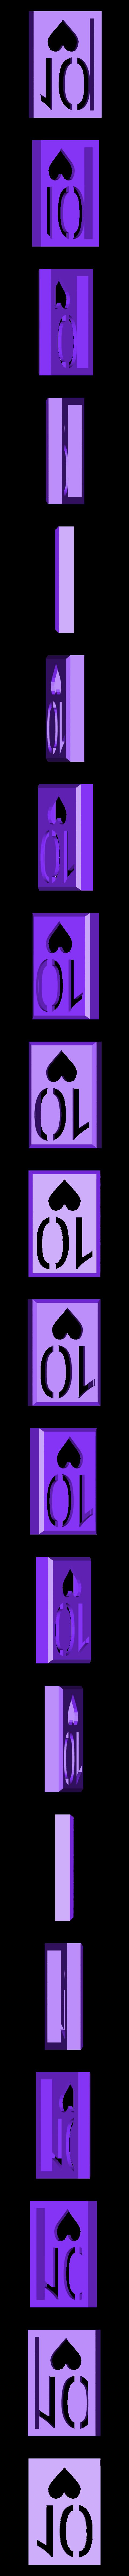 BlockHearts10.stl Download STL file Playing Card Tiles • Object to 3D print, Jinja